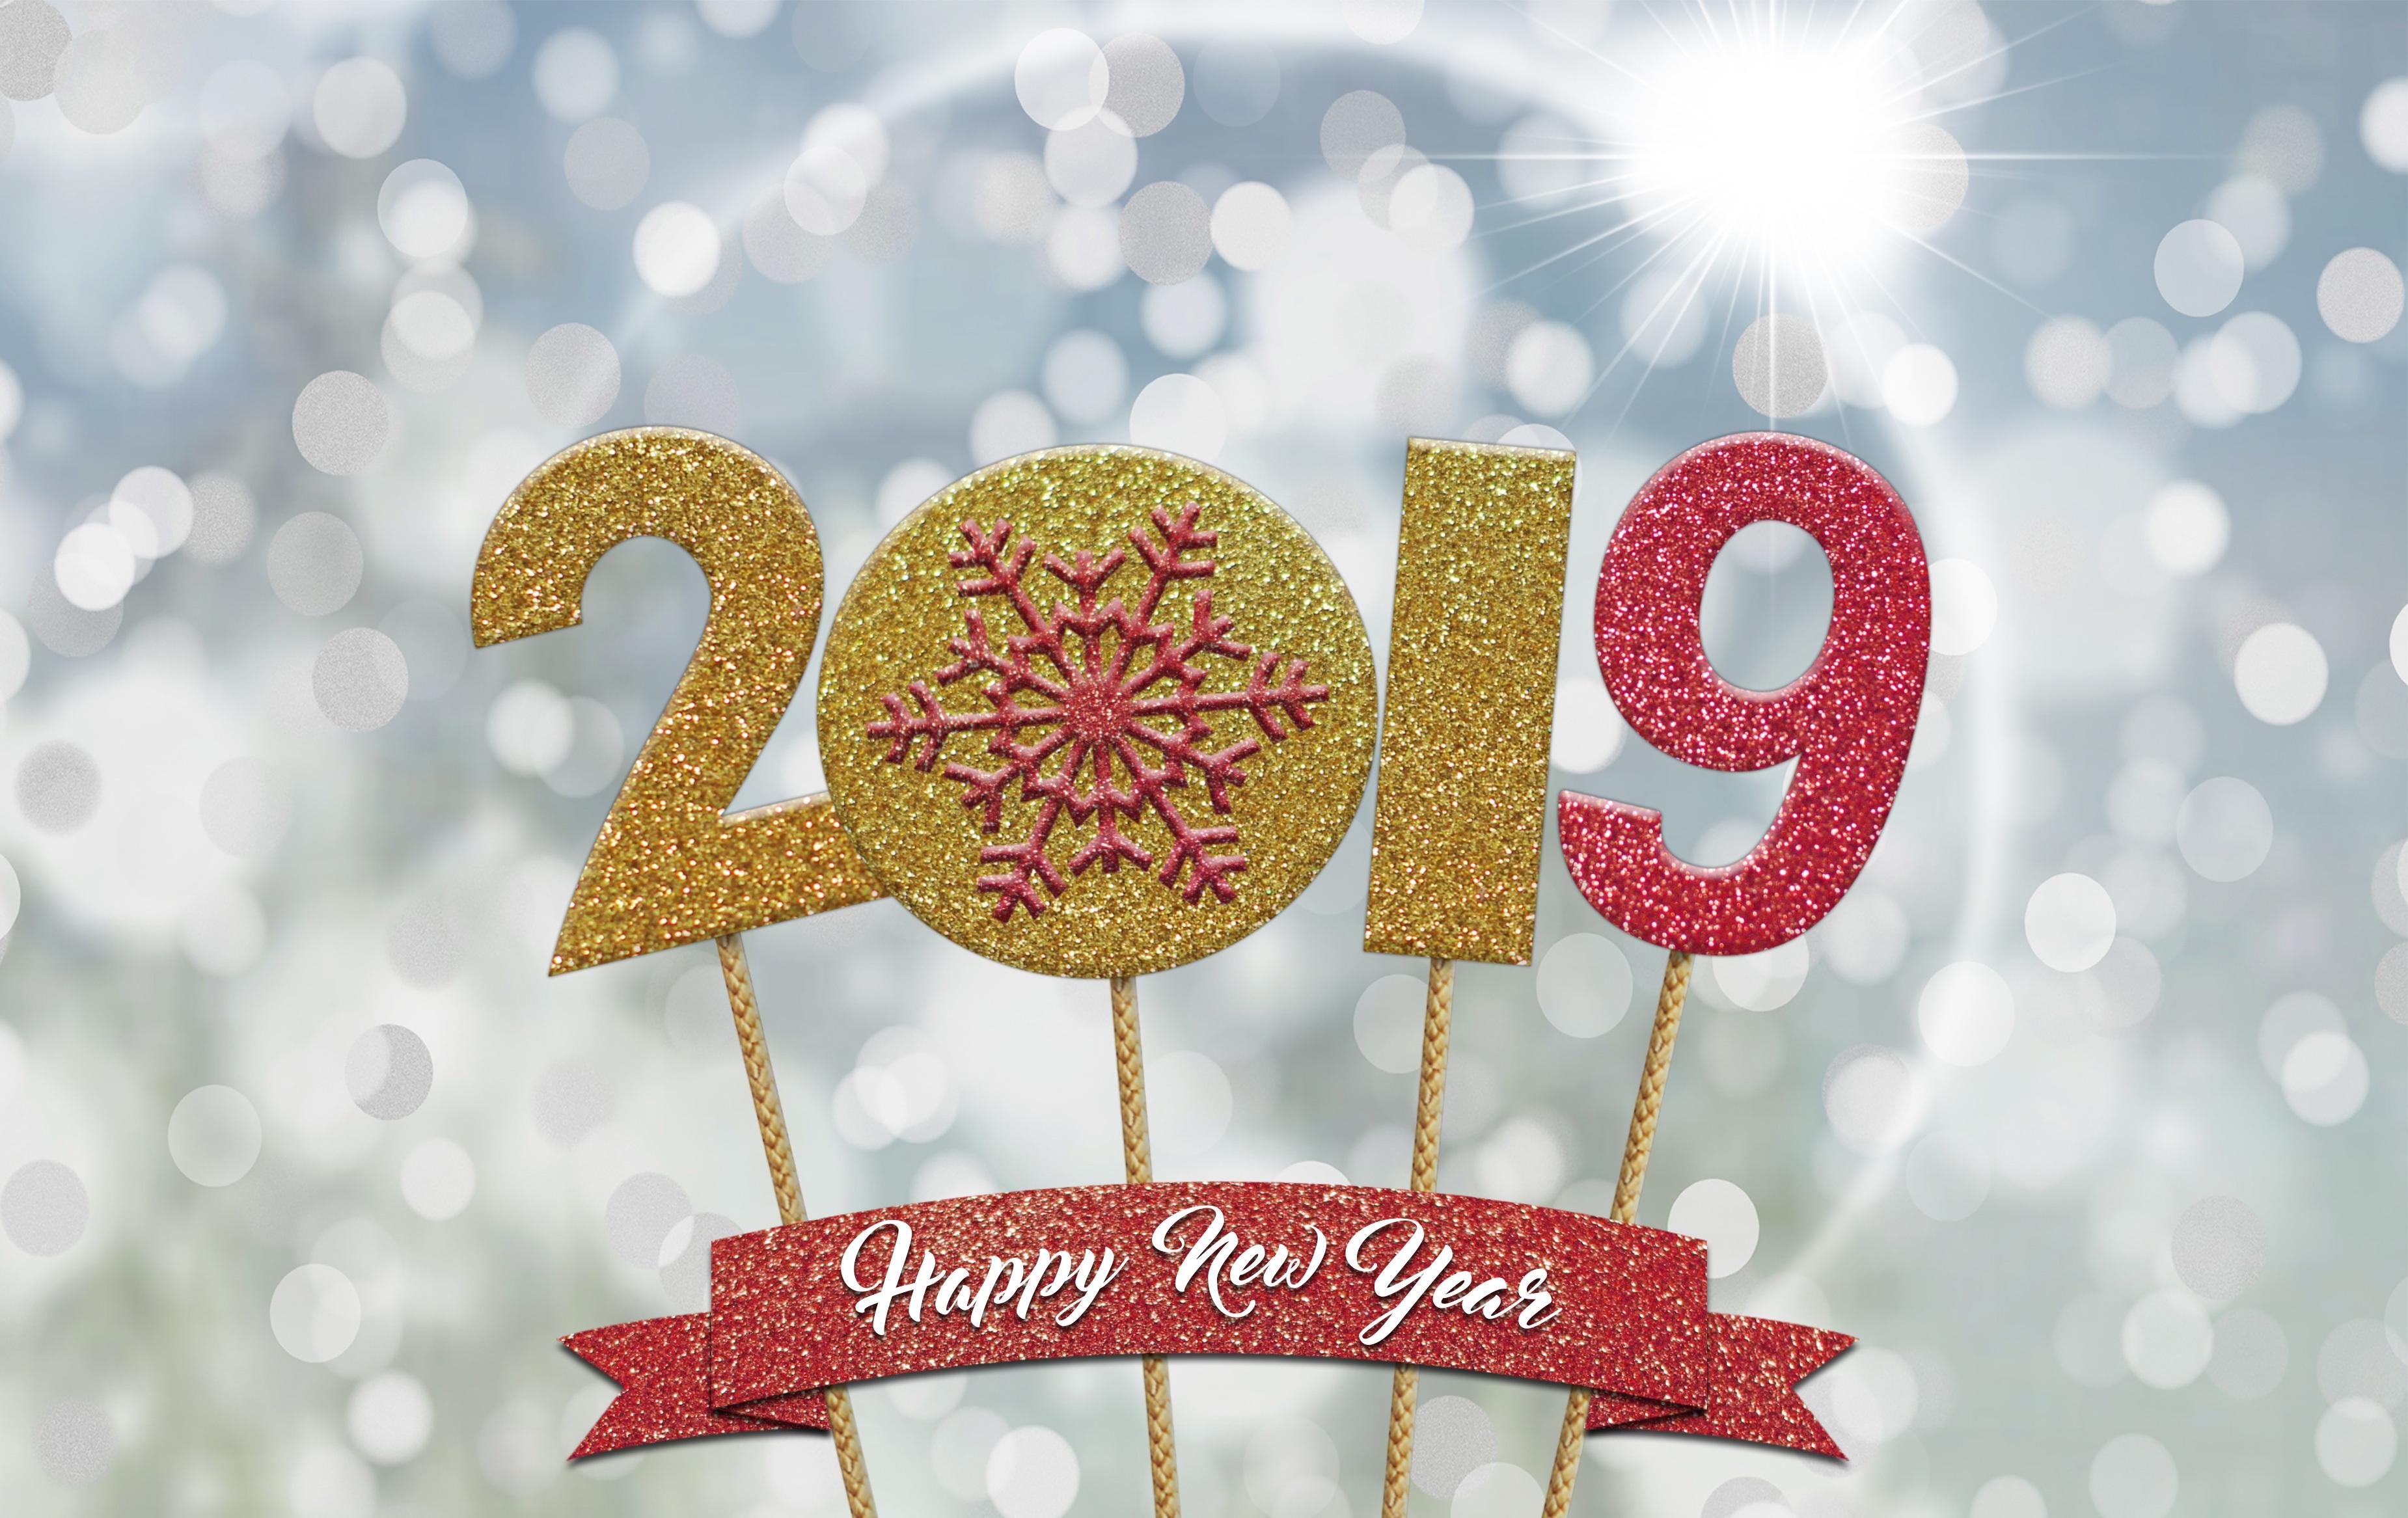 Happy healthy new year 2019